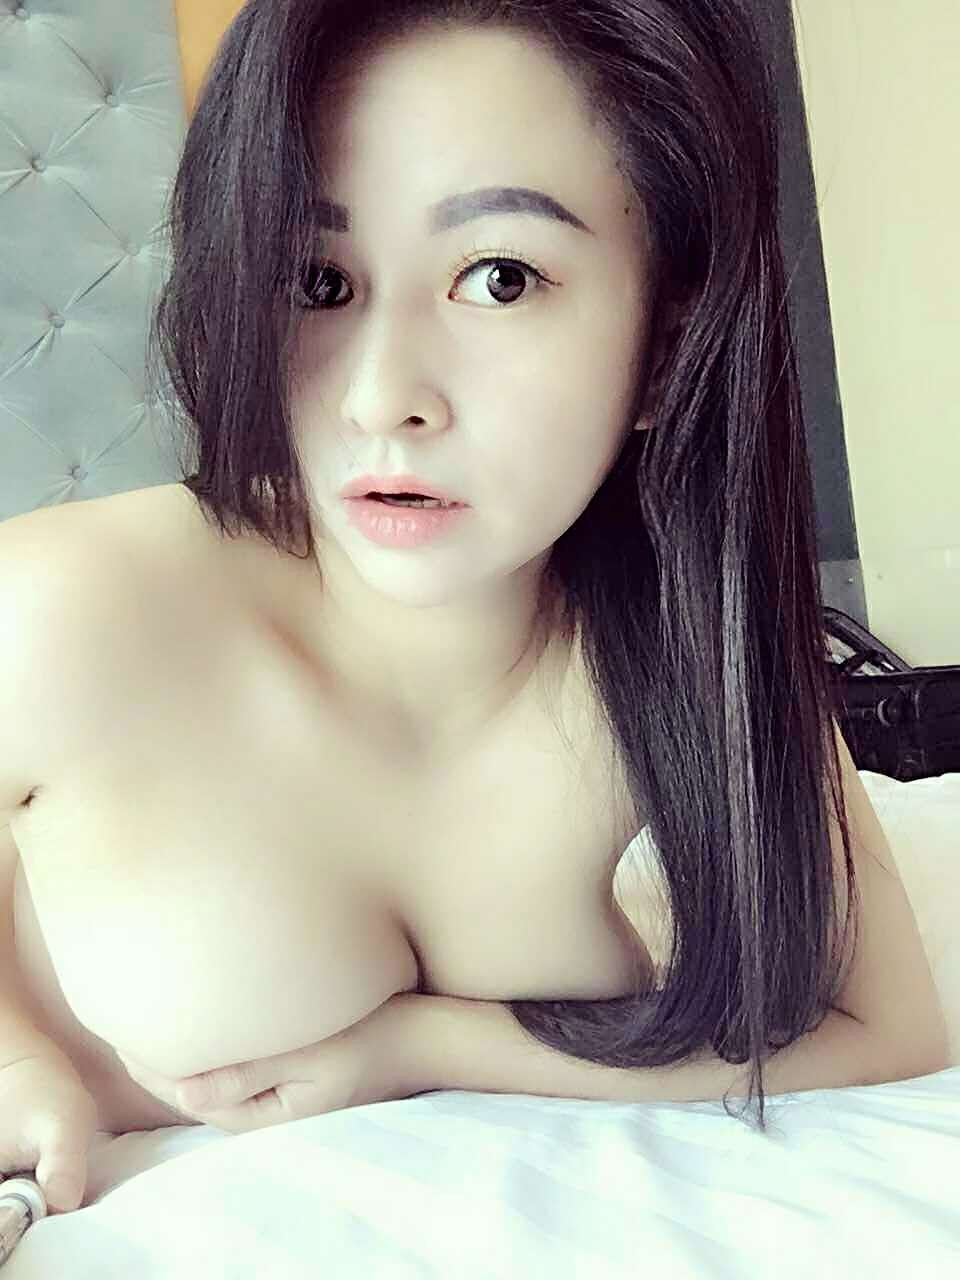 sexygirl escort bdsm